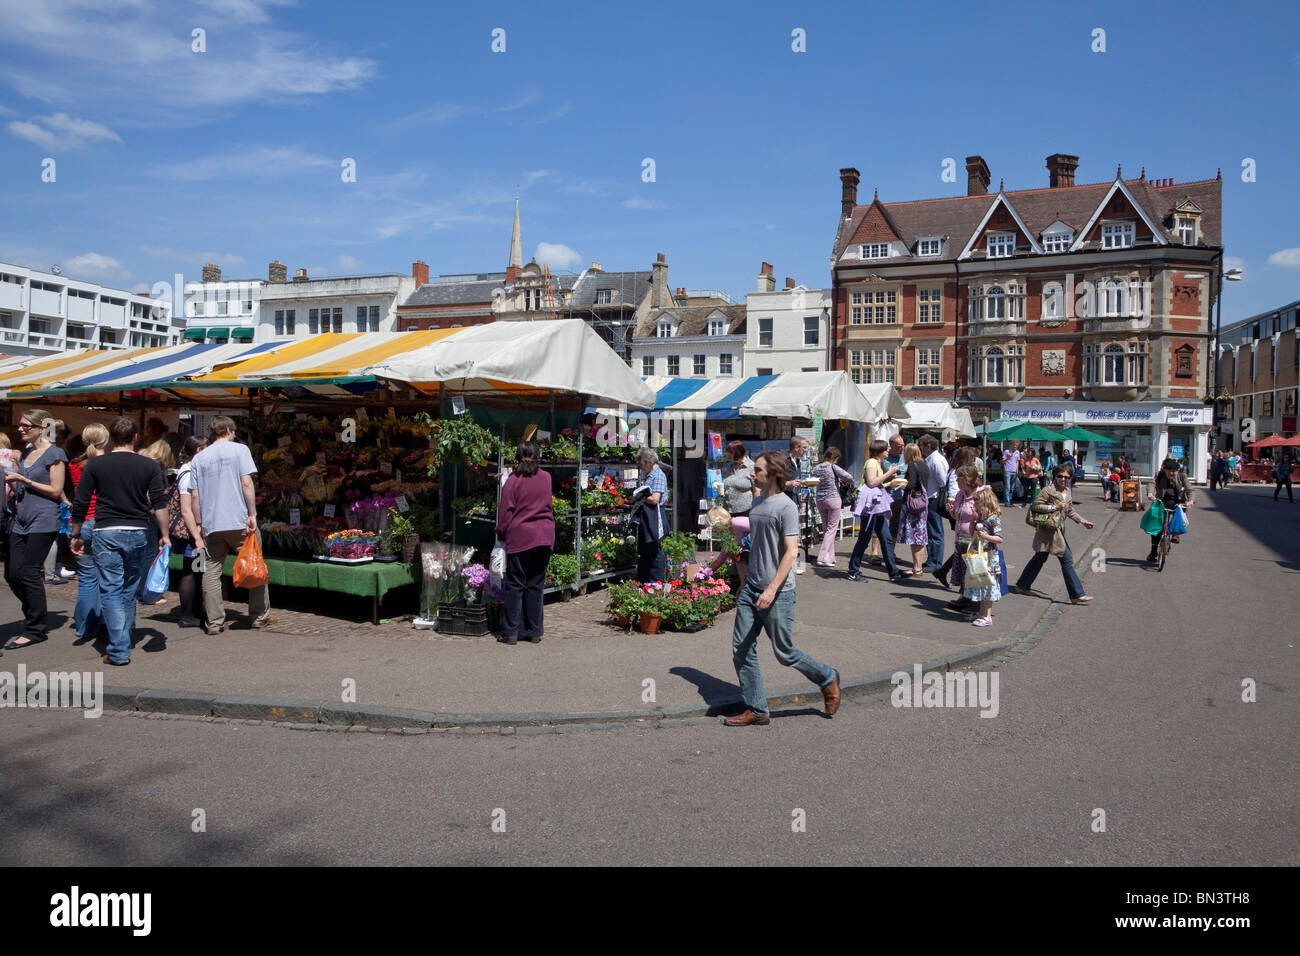 Market in the university city of Cambridge, England - Stock Image